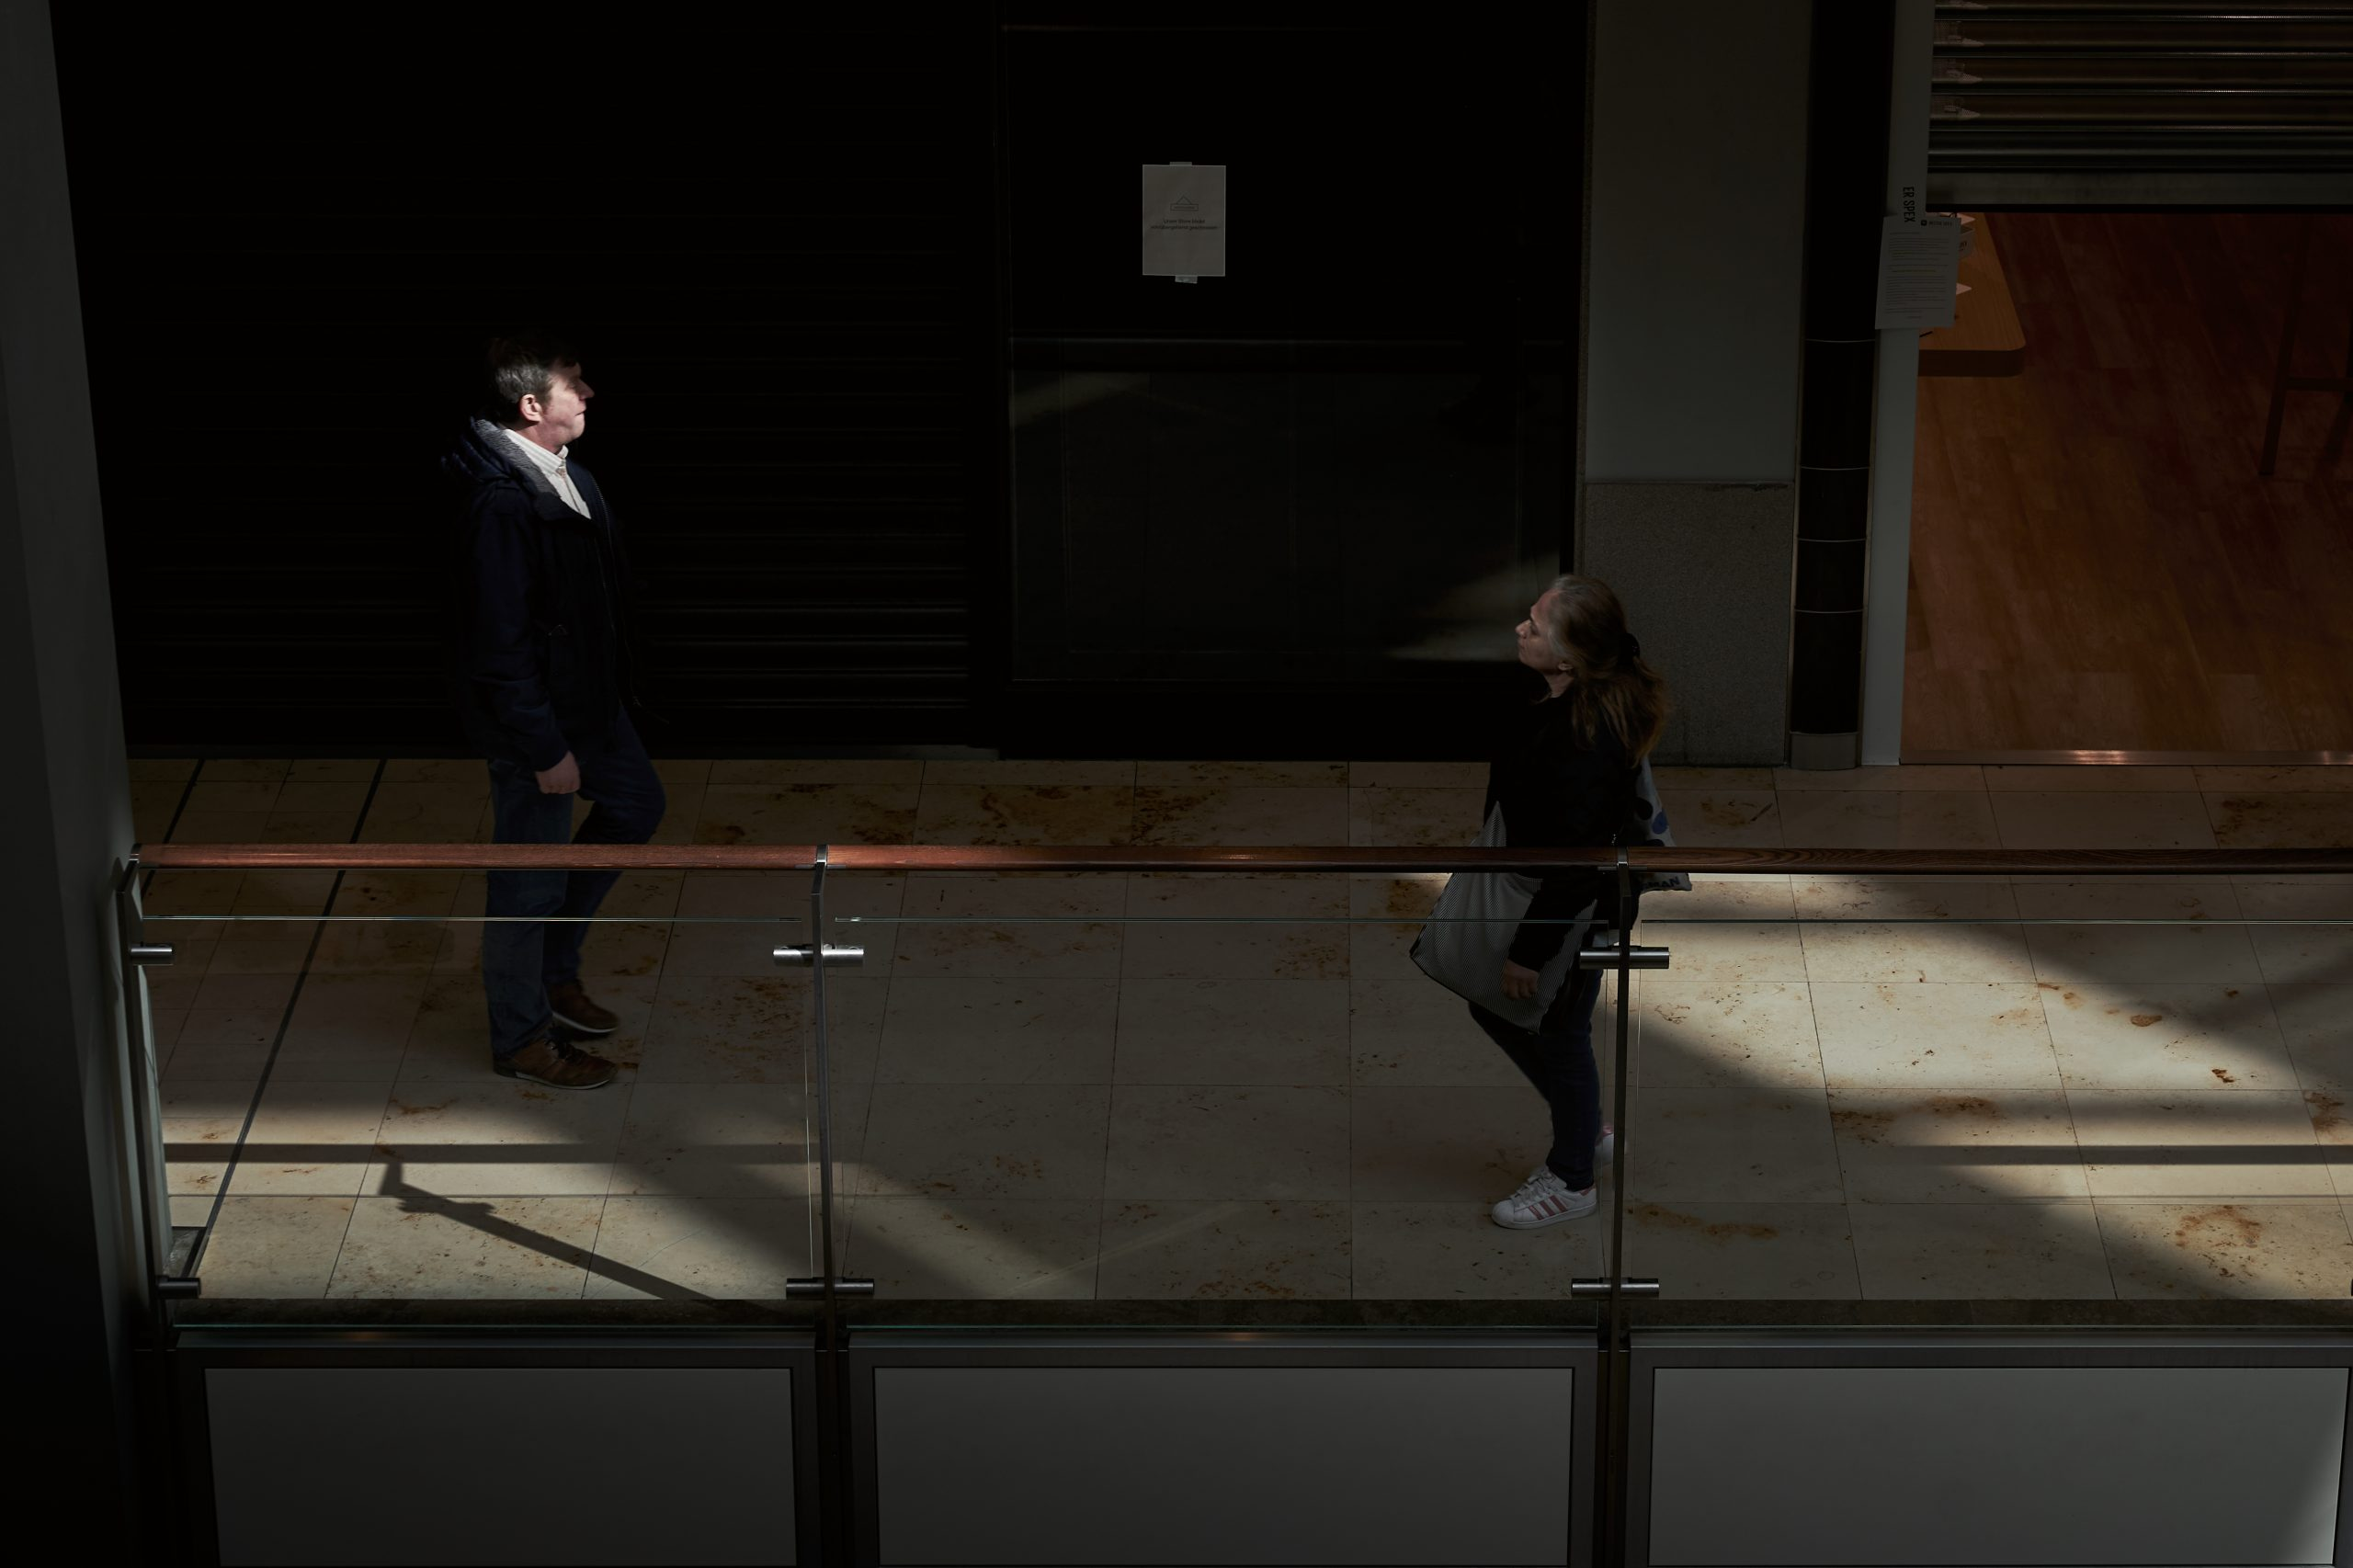 Cynthia Ruf Photography Fotografie Street Lockdown Kontrast